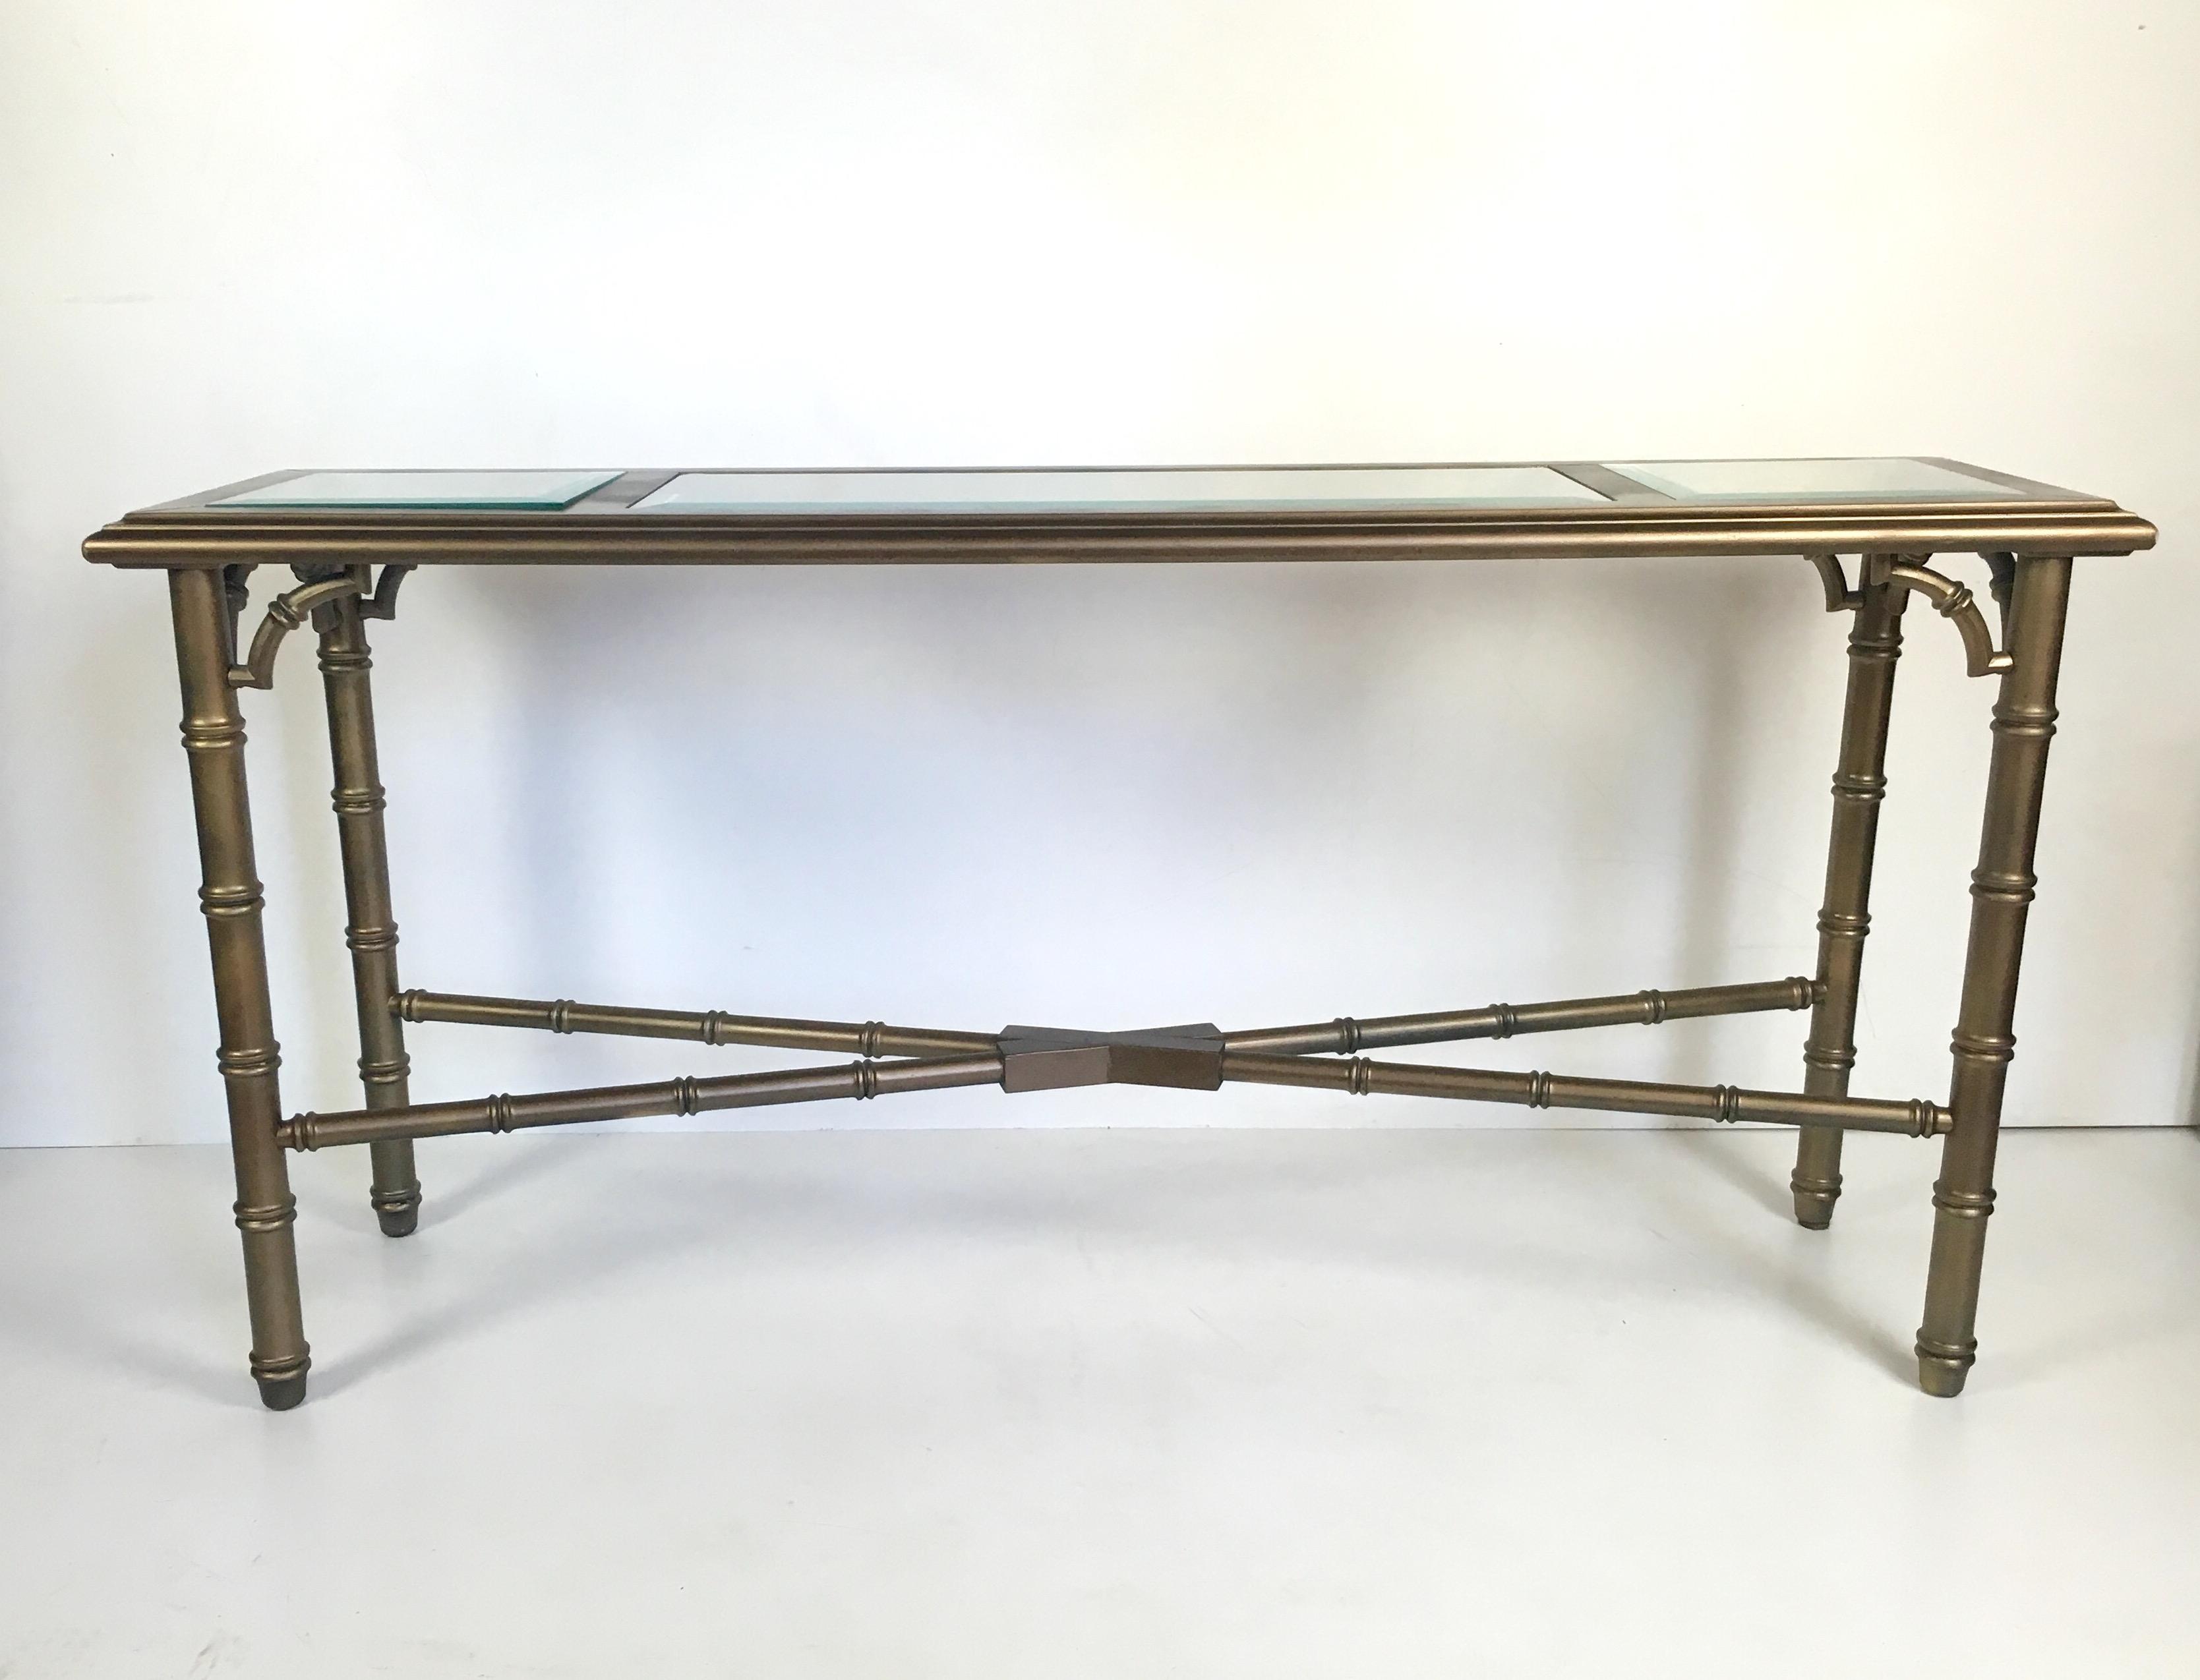 Attirant Lane Faux Bamboo Lacquered Sofa Table   Image 3 Of 6